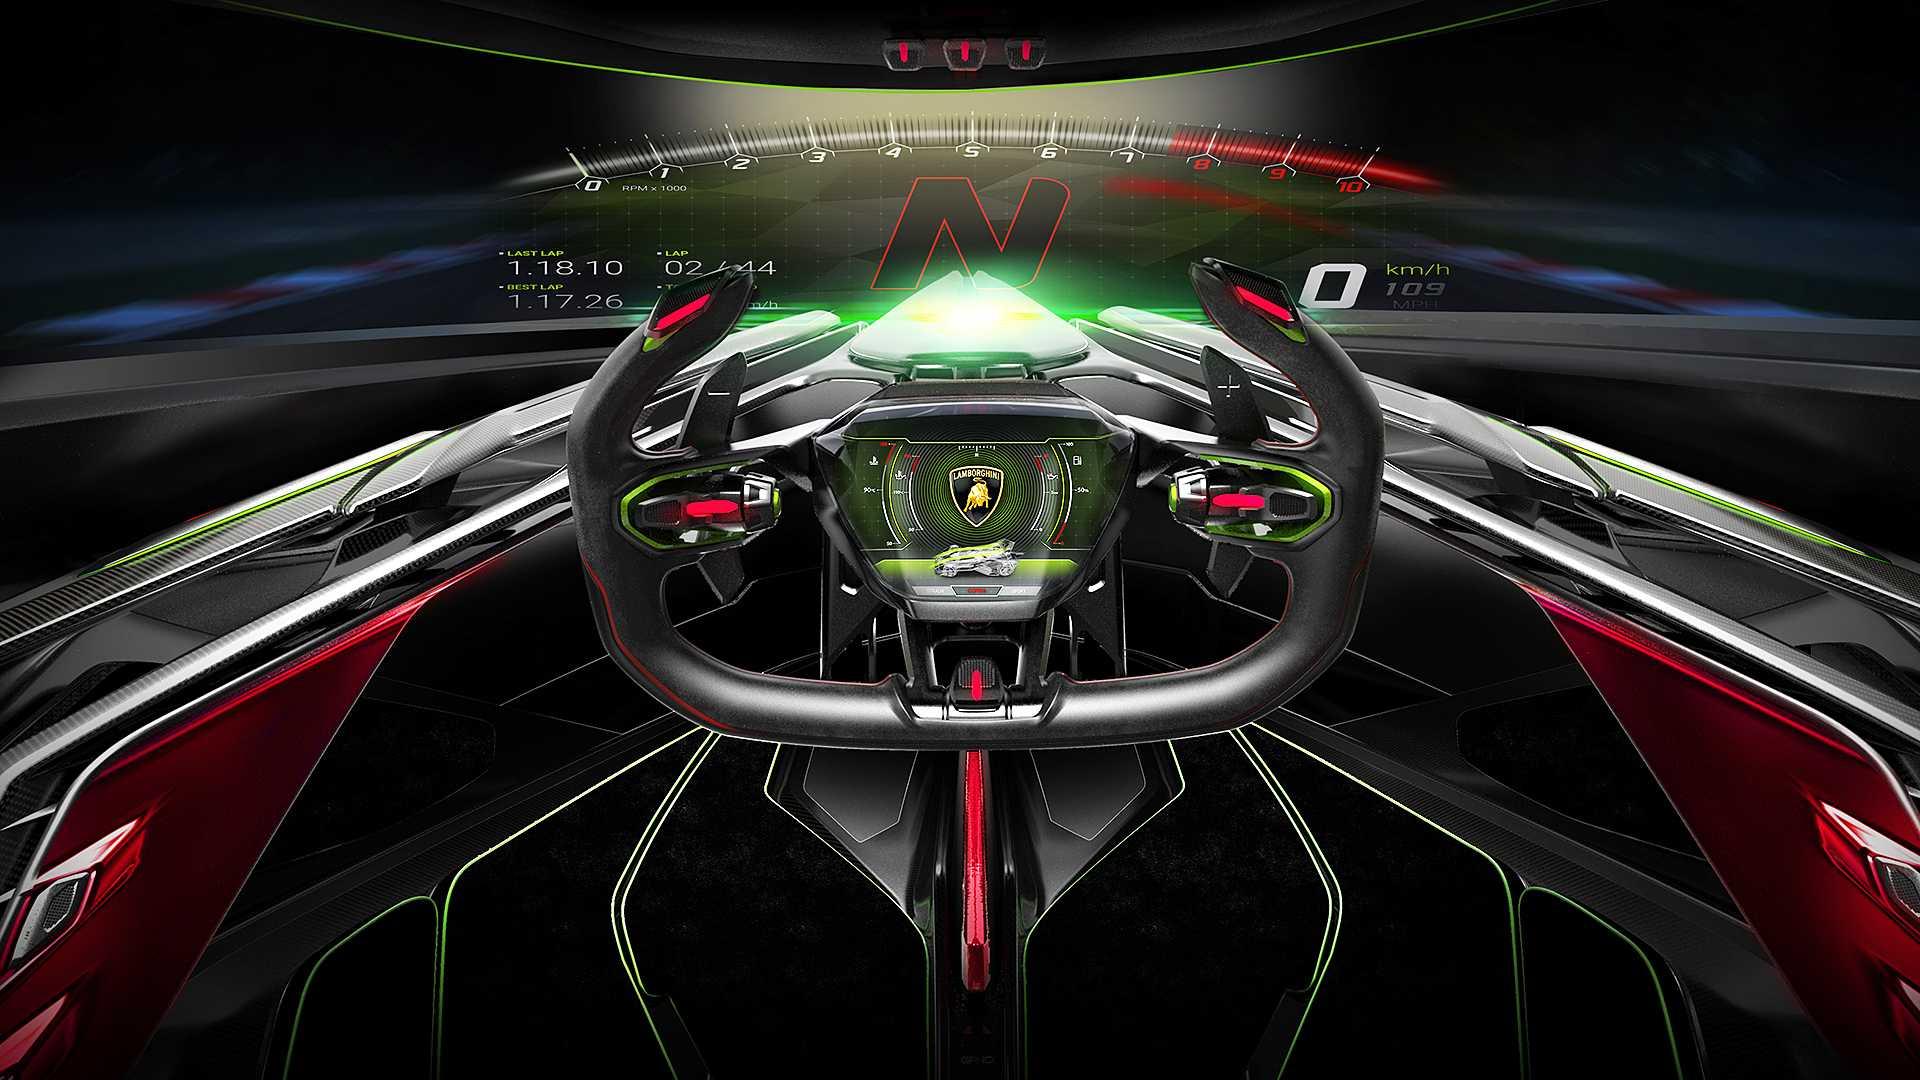 Lamborghini-V12-Vision-Gran-Turismo-23